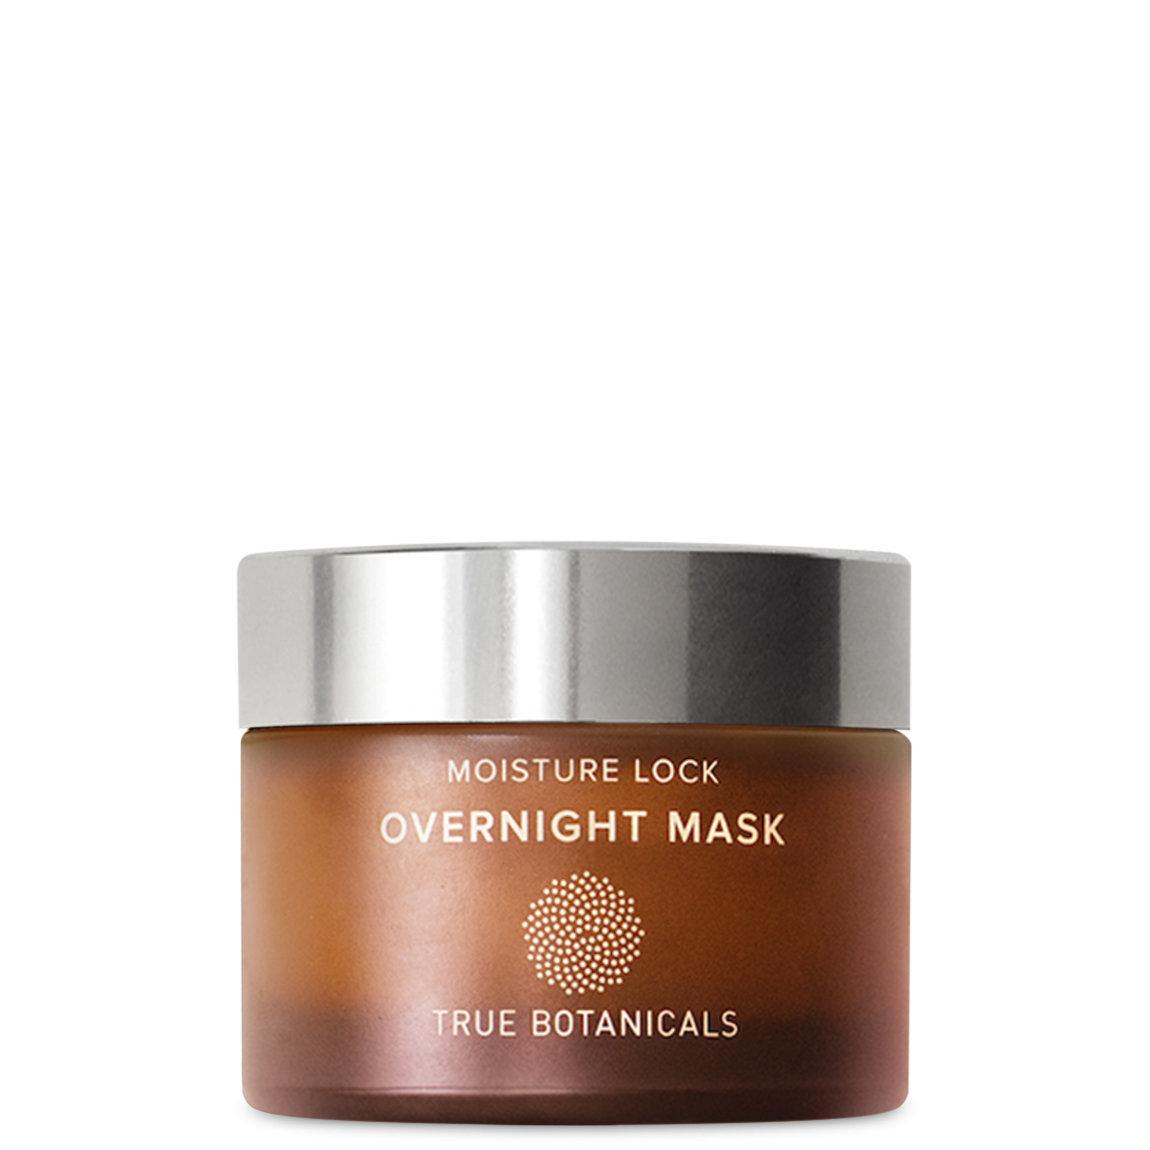 True Botanicals Moisture Lock Overnight Mask alternative view 1 - product swatch.